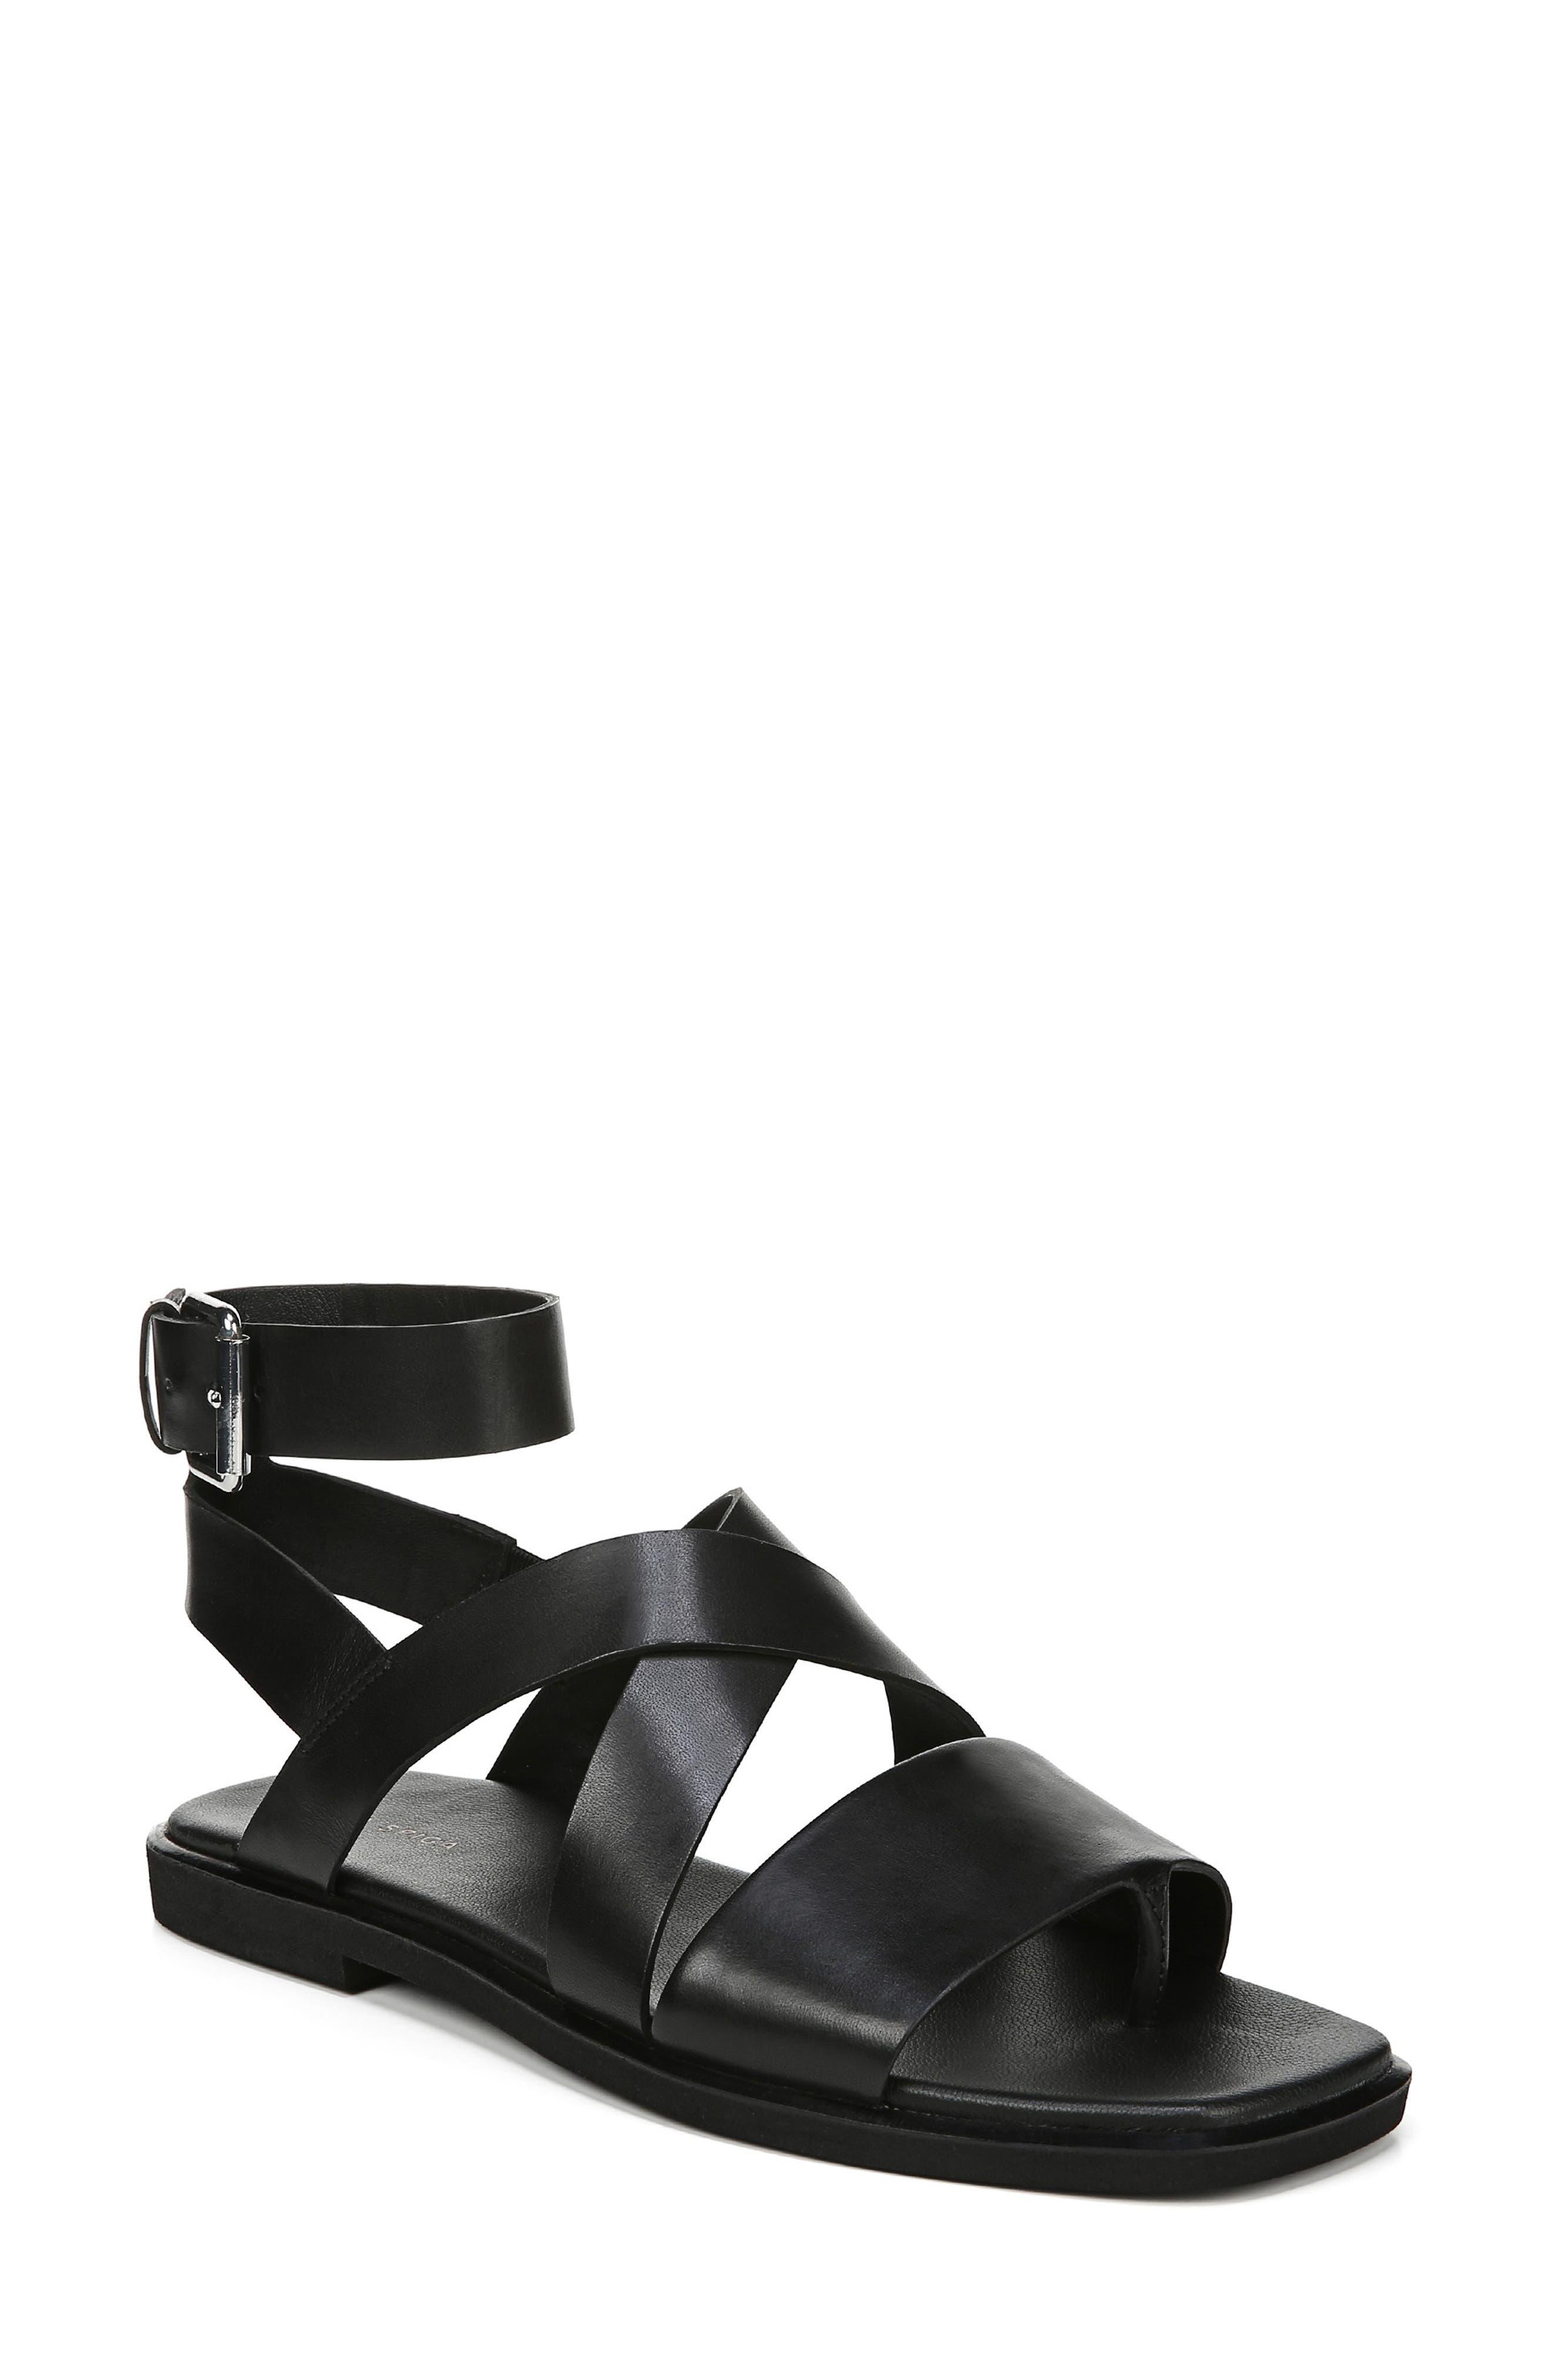 530ebaa759a99 Via Spiga Sale, Women's Shoes